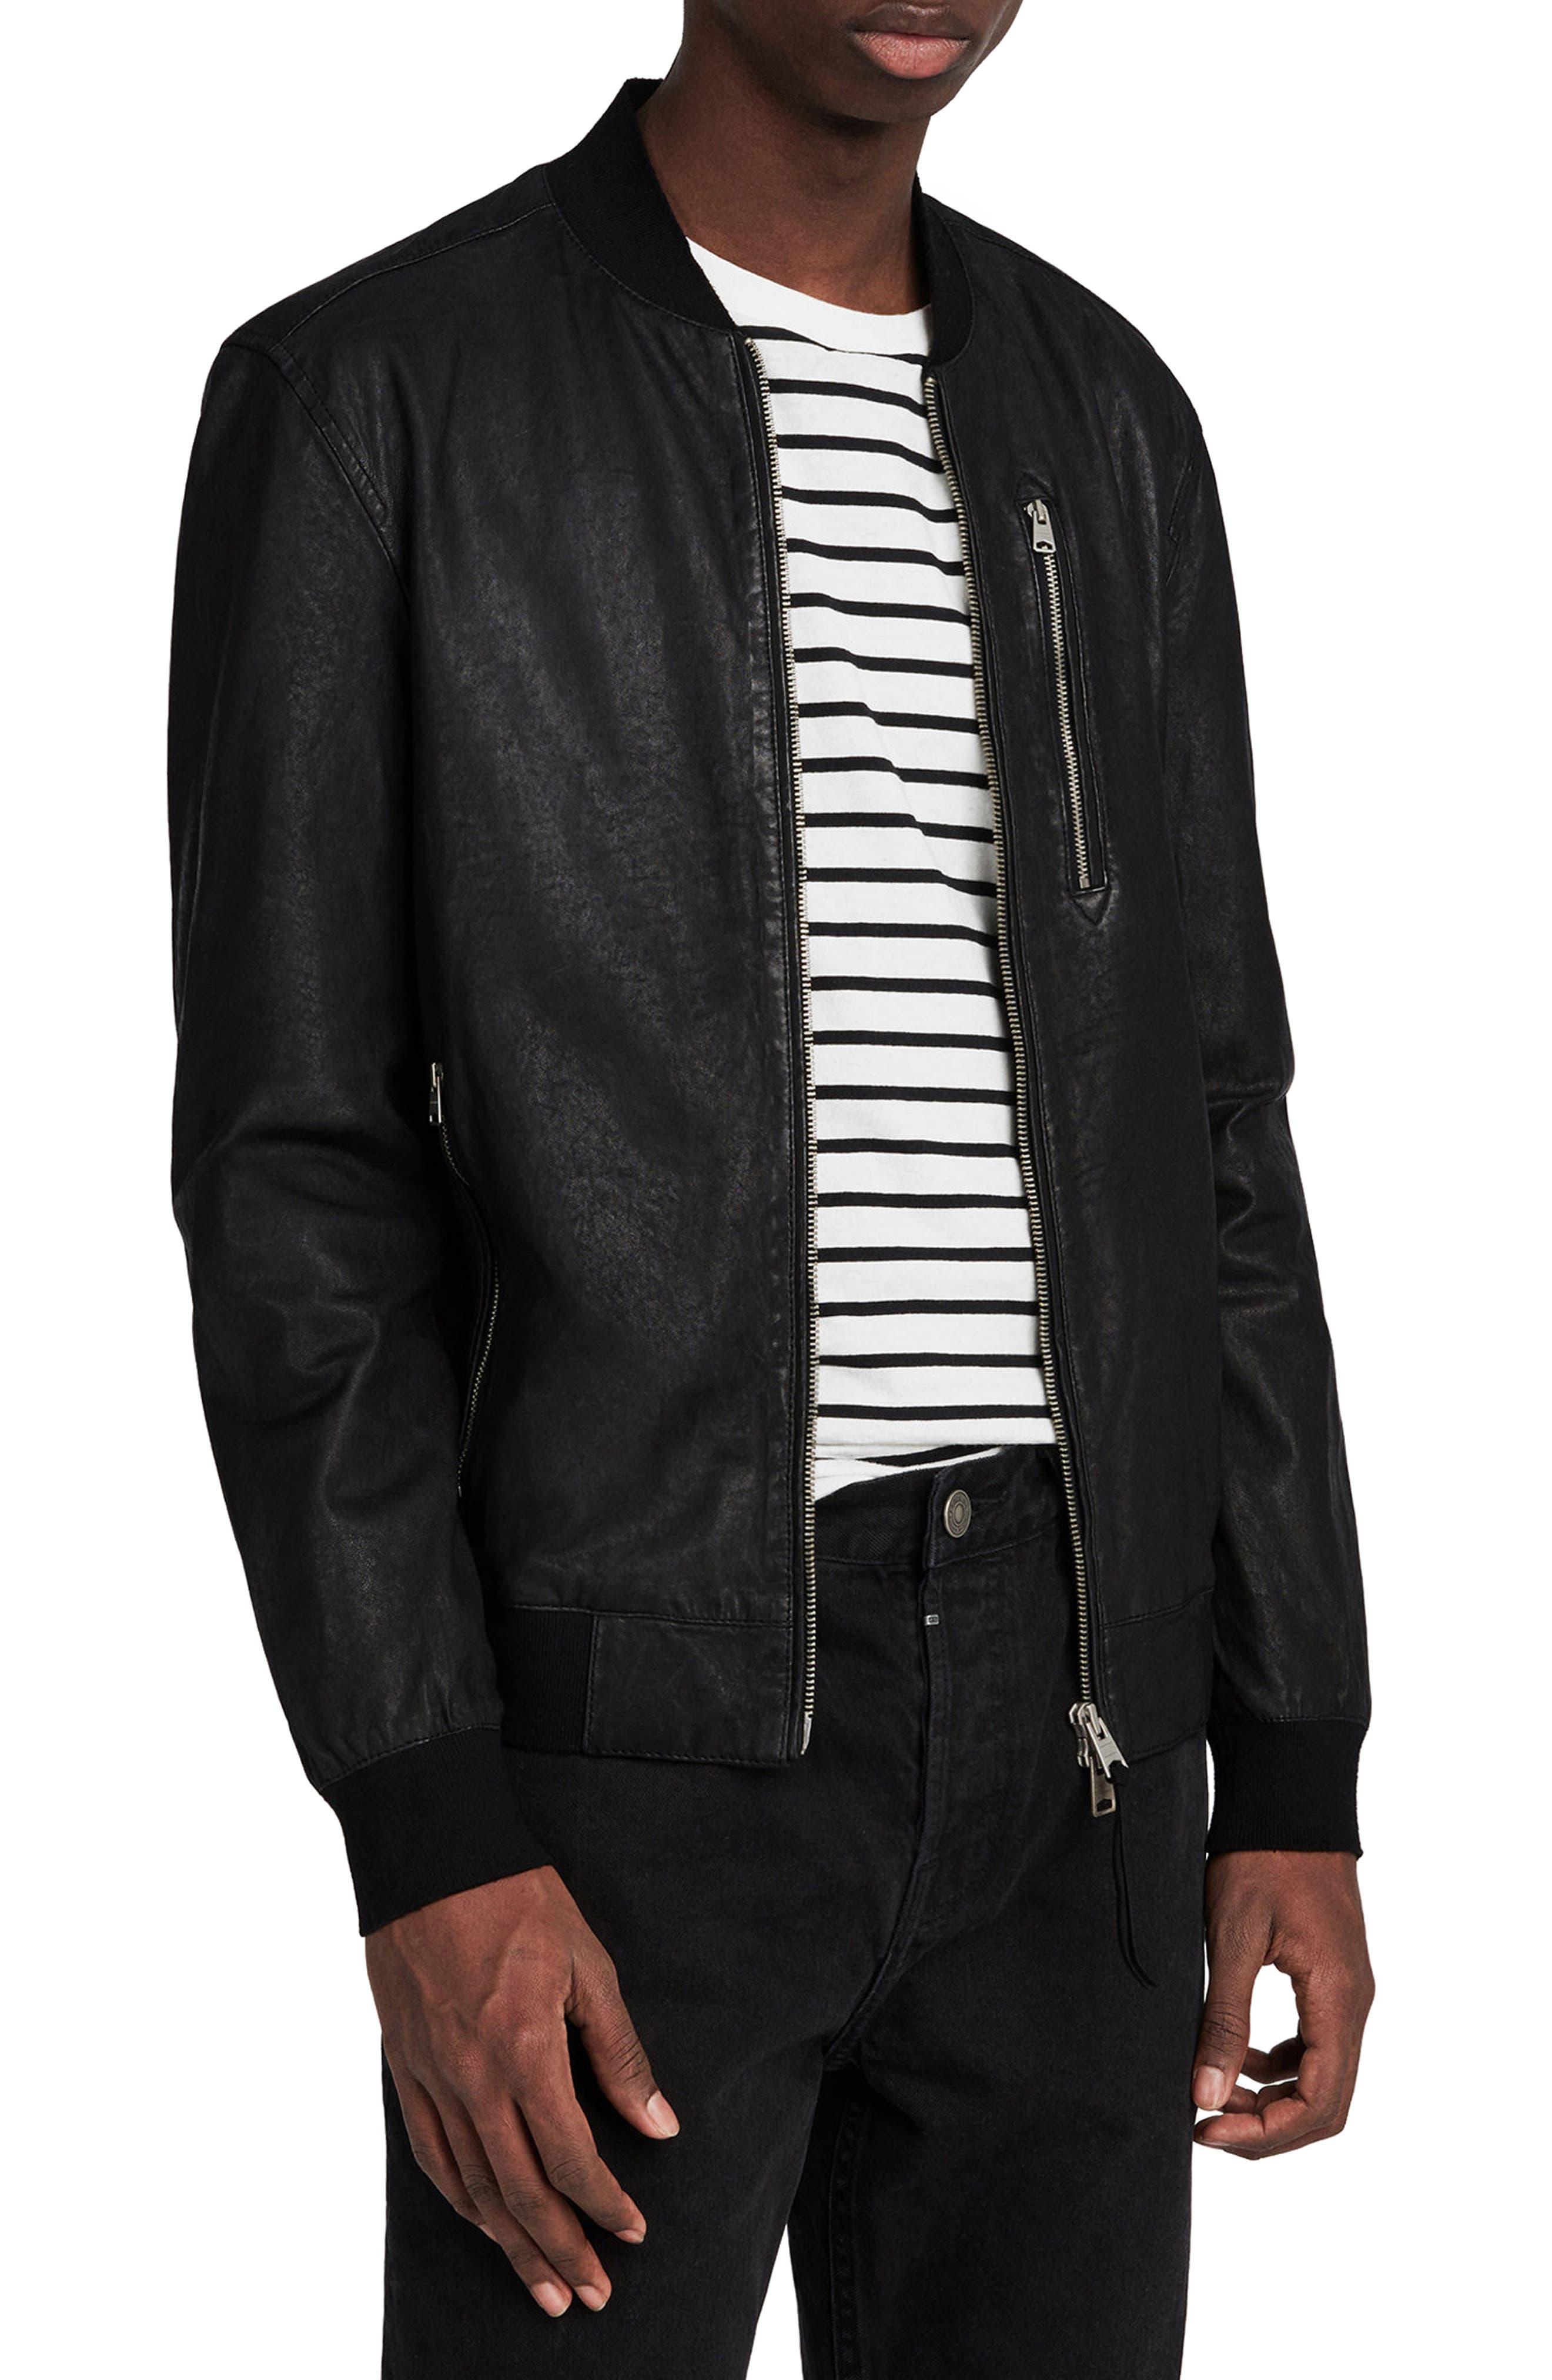 ALLSAINTS, Kino Leather Bomber Jacket, Main thumbnail 1, color, BLACK